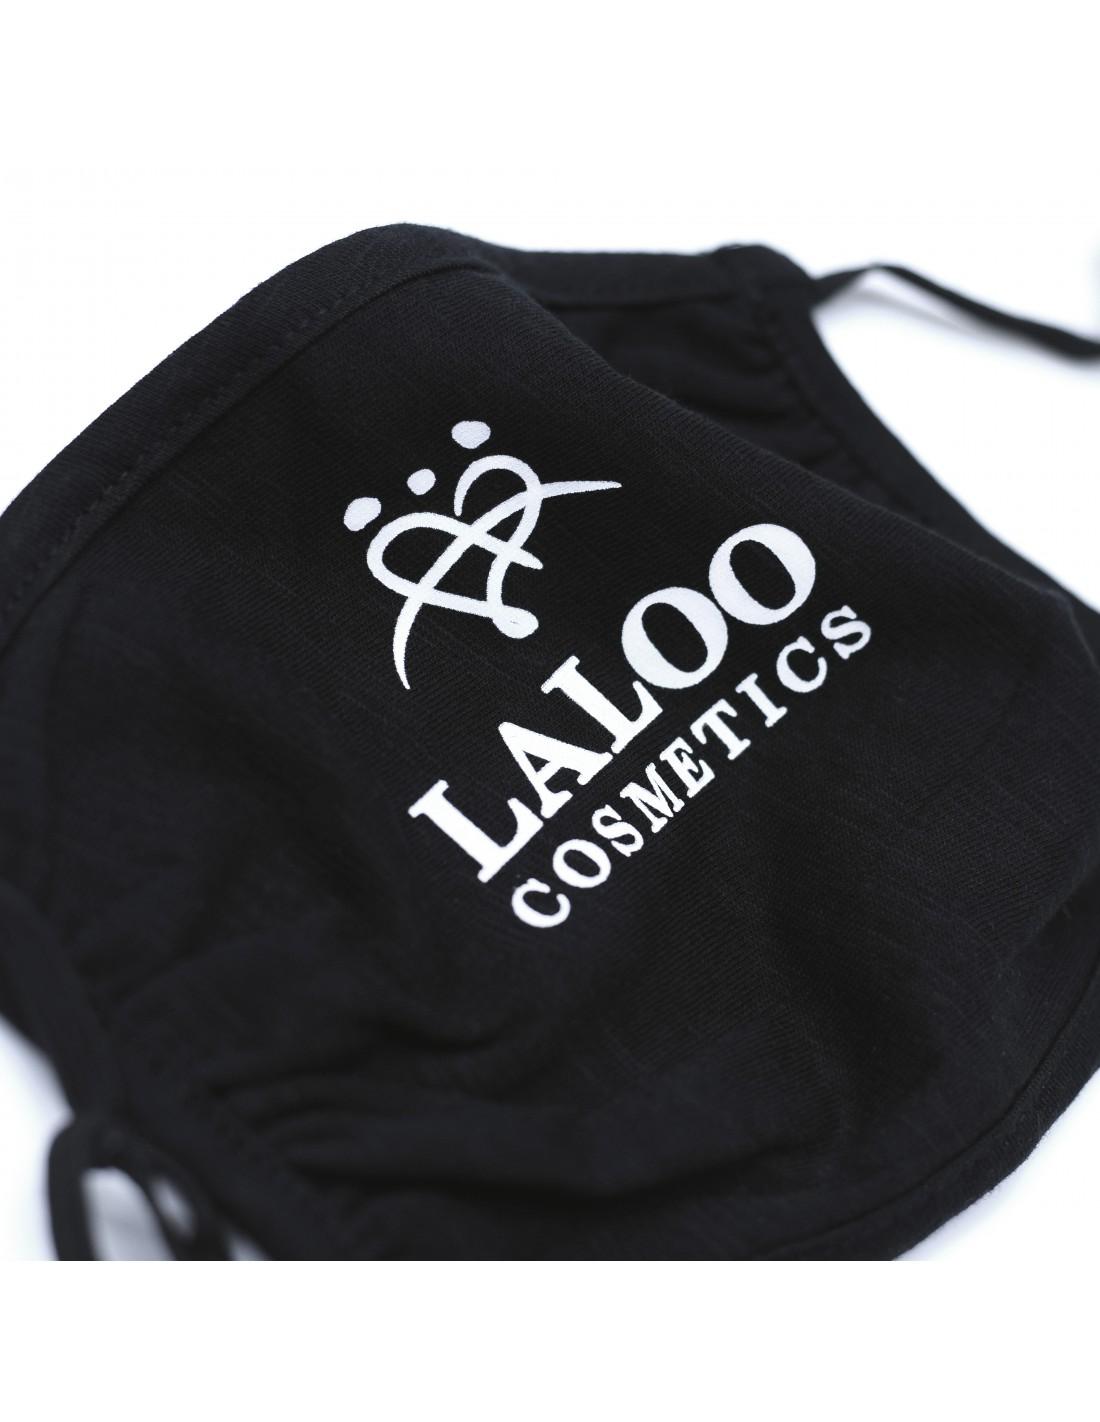 Laloo Cosmetics: Η νέα πρόταση για το καλοκαίρι έφτασε από